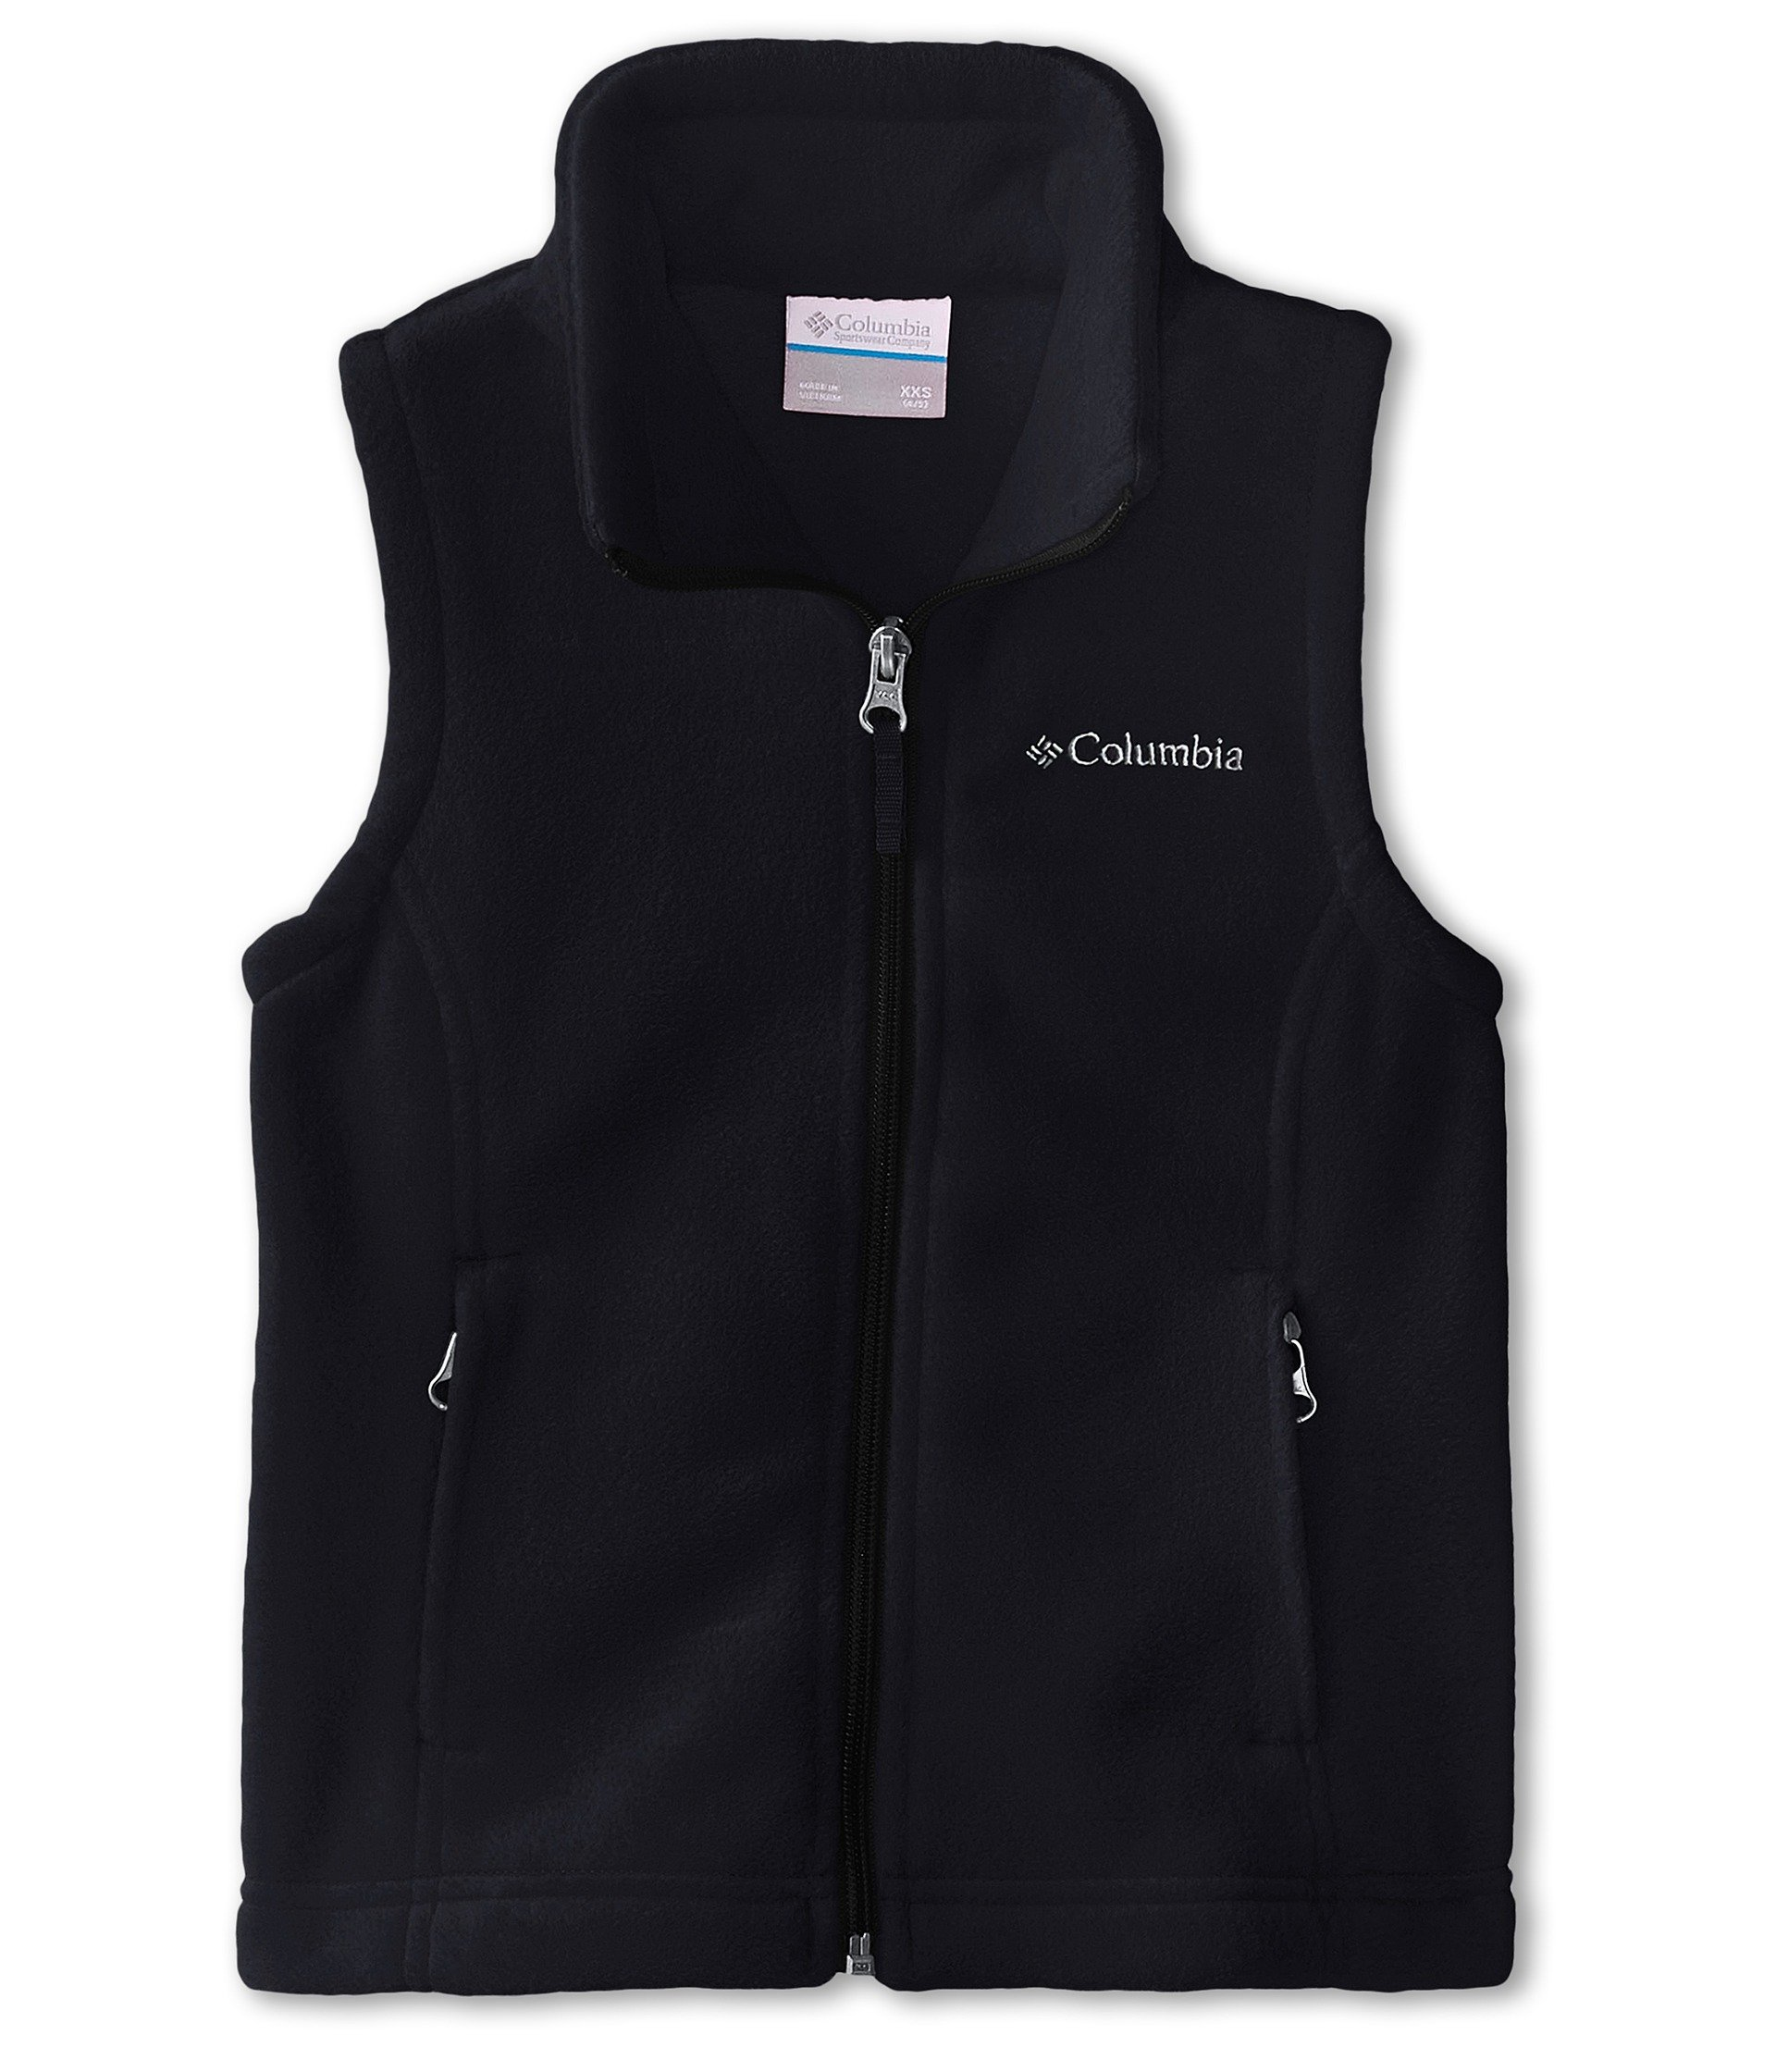 a02174eb1d12 Girls Columbia Kids Coats   Outerwear + FREE SHIPPING